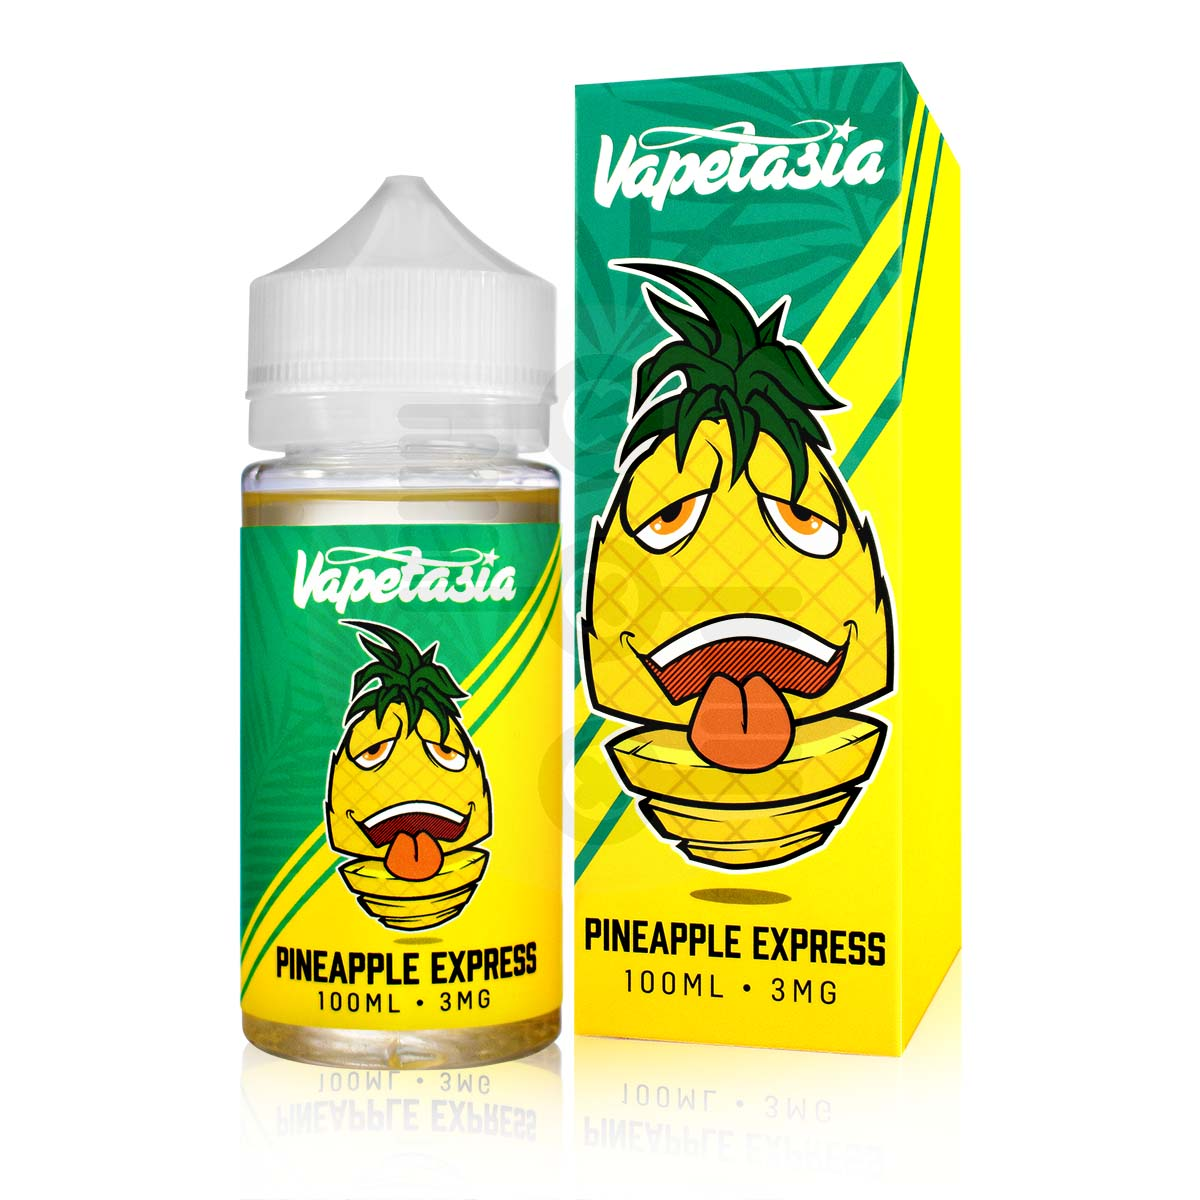 Vapetasia-Pineapple-Express-100ml